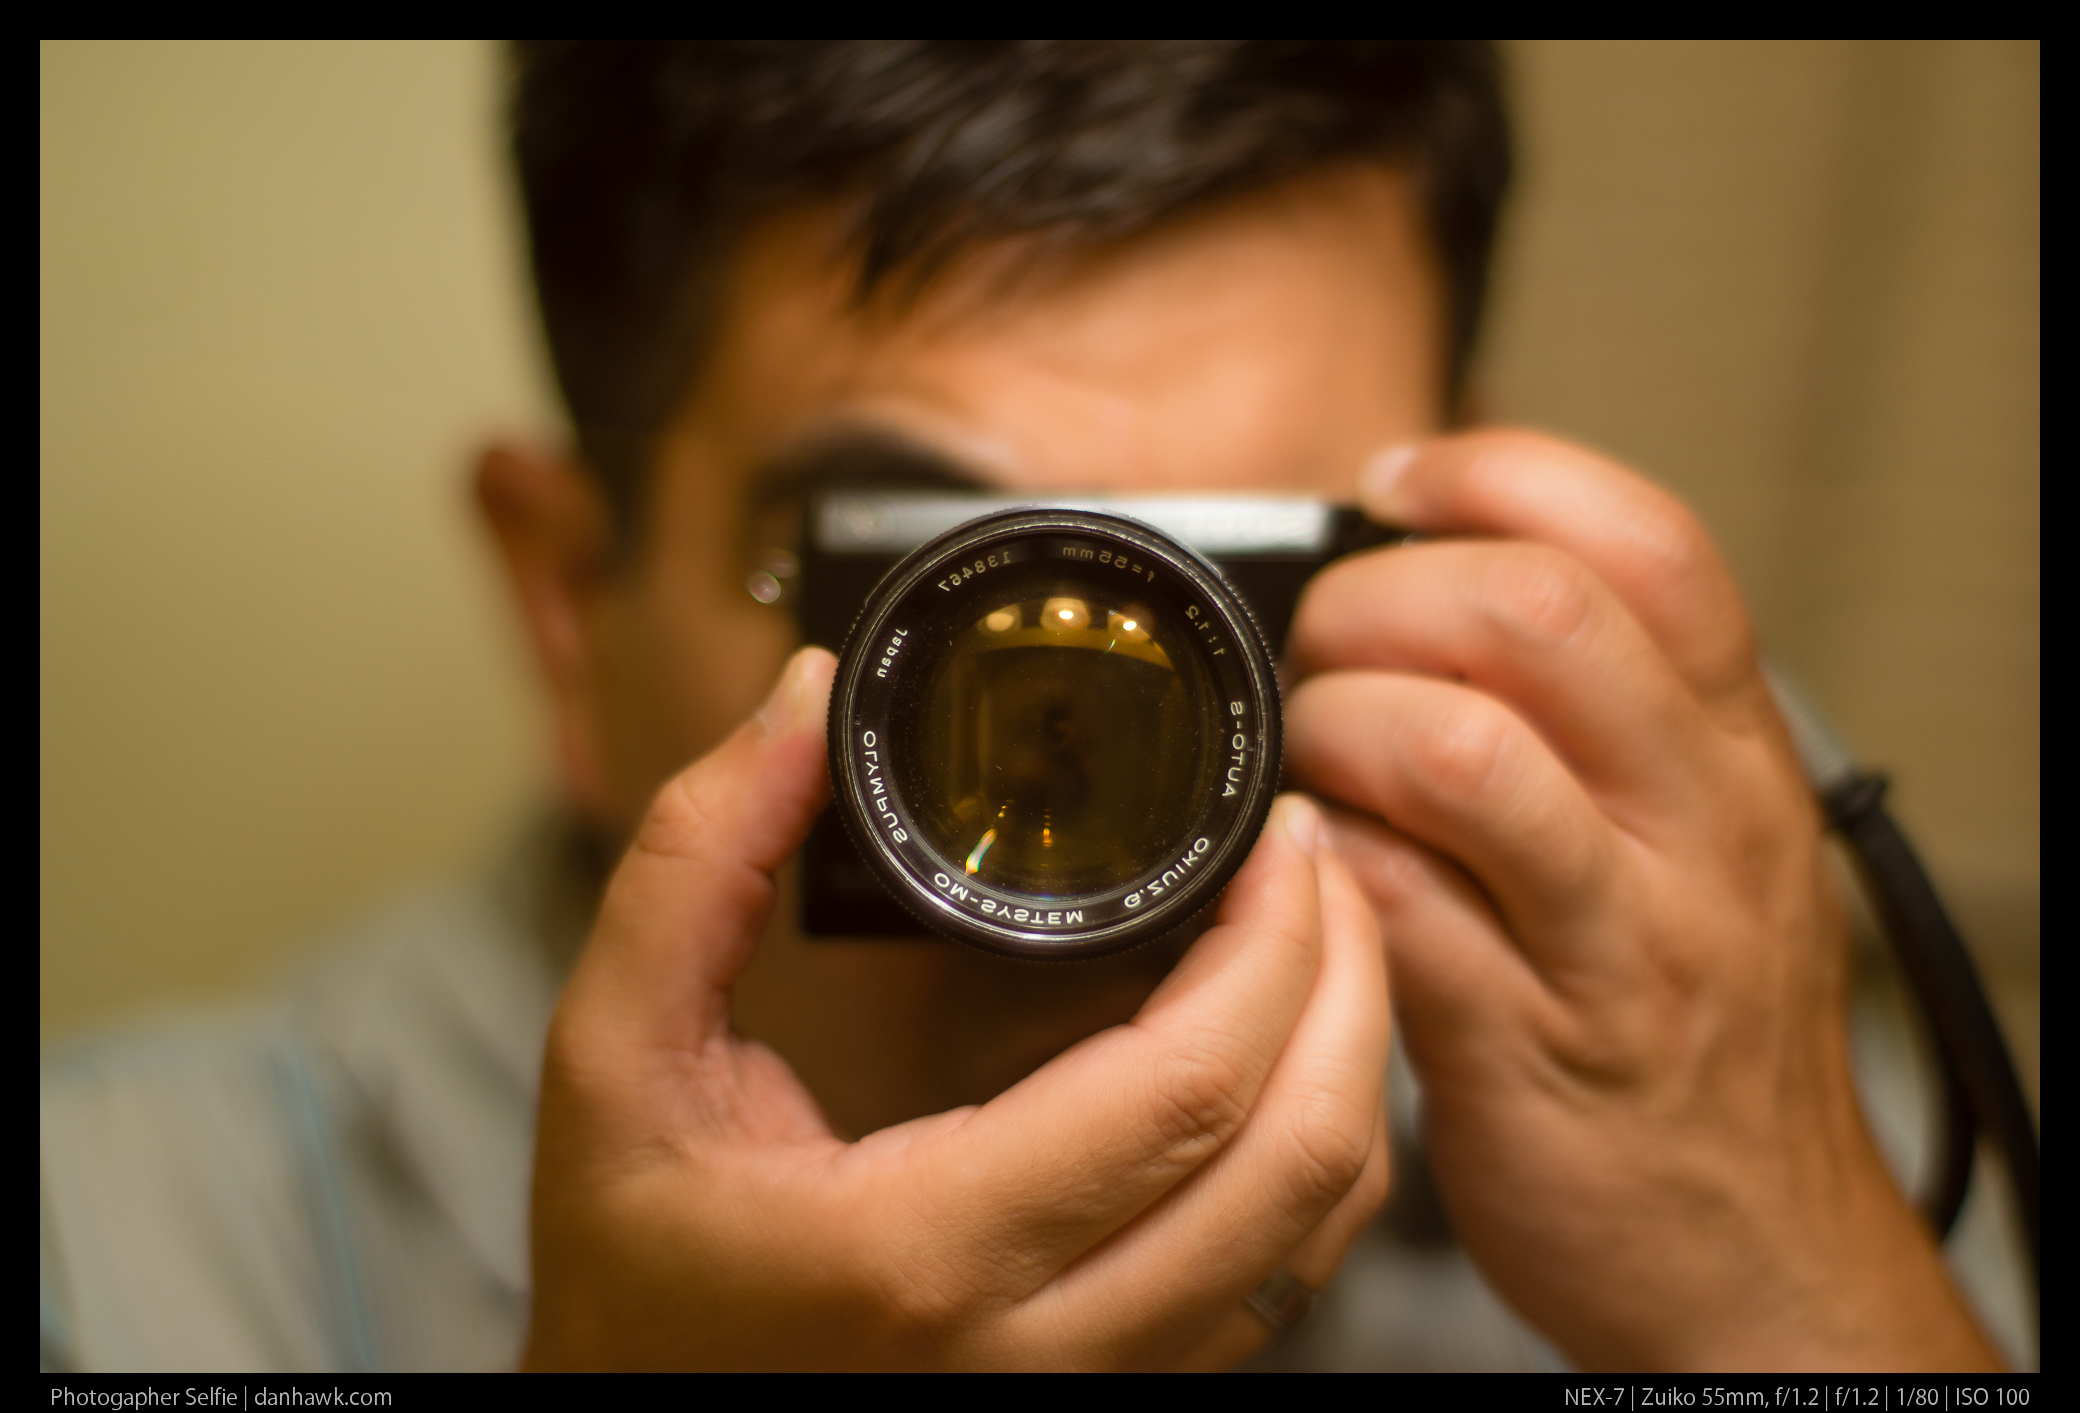 Photogapher Selfie